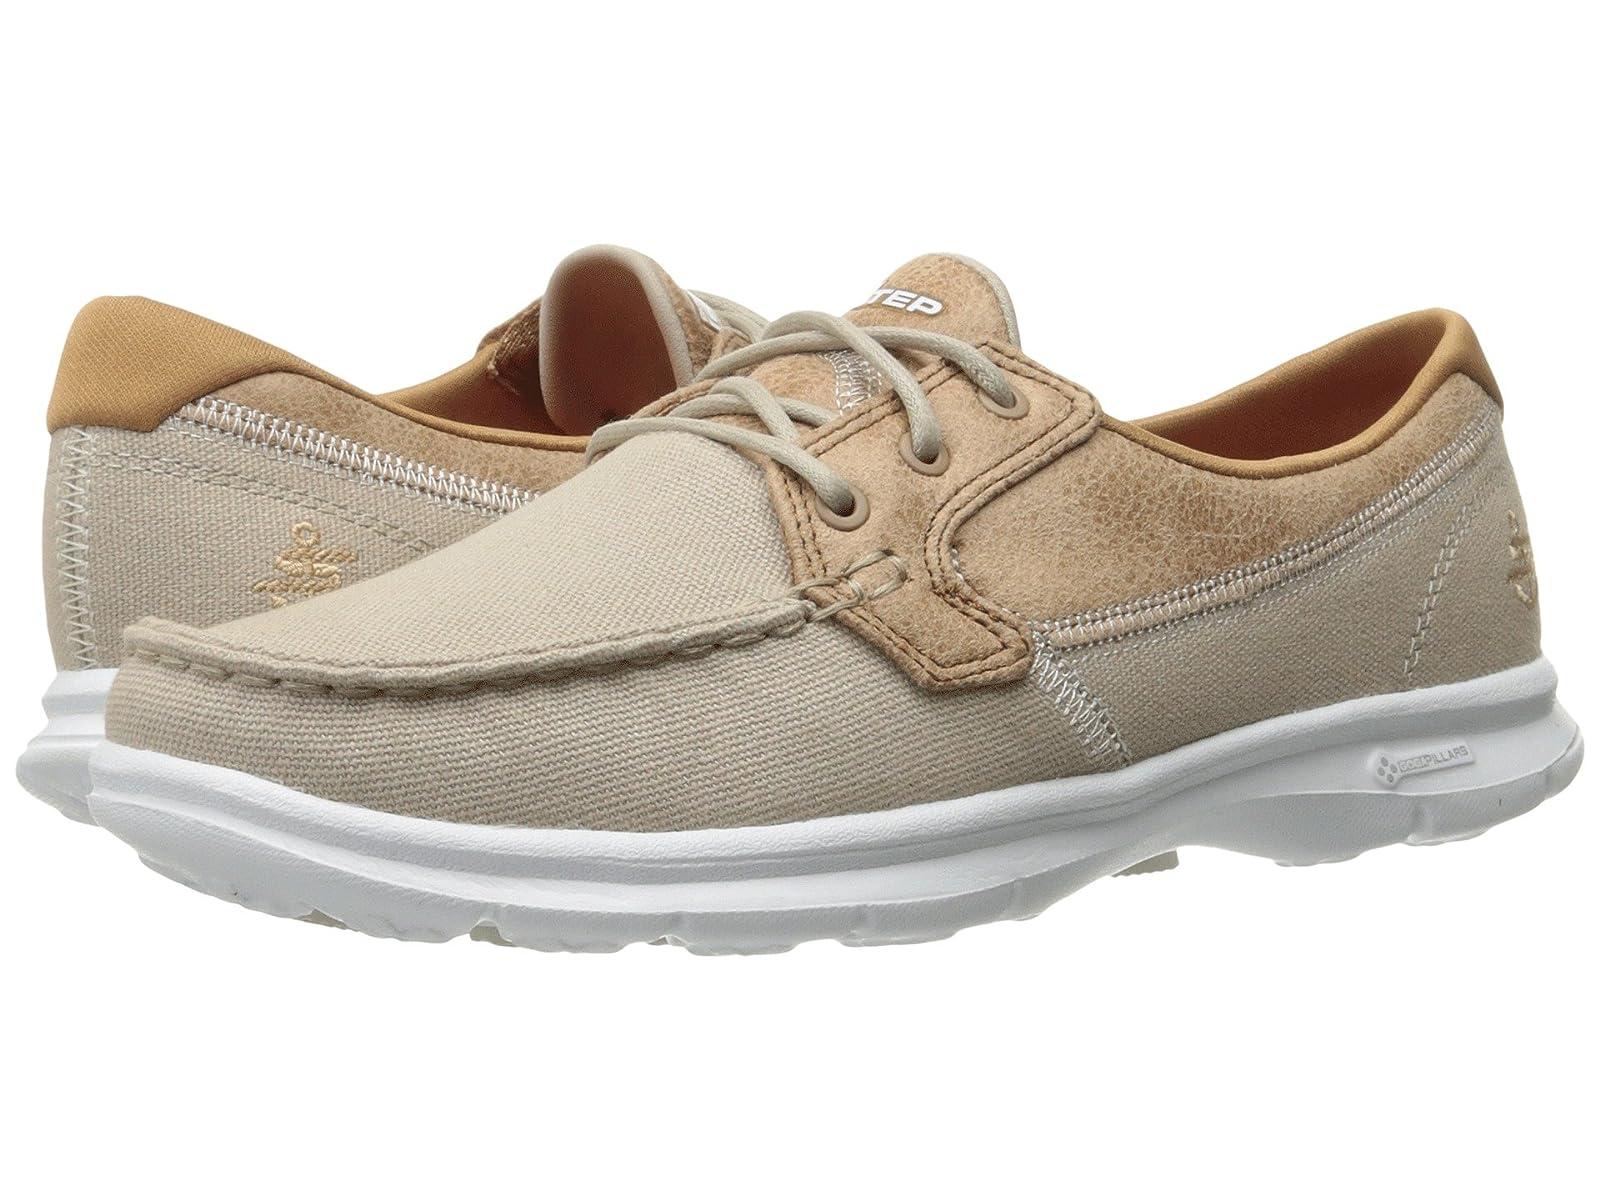 SKECHERS Performance Go Step - SeashoreCheap and distinctive eye-catching shoes